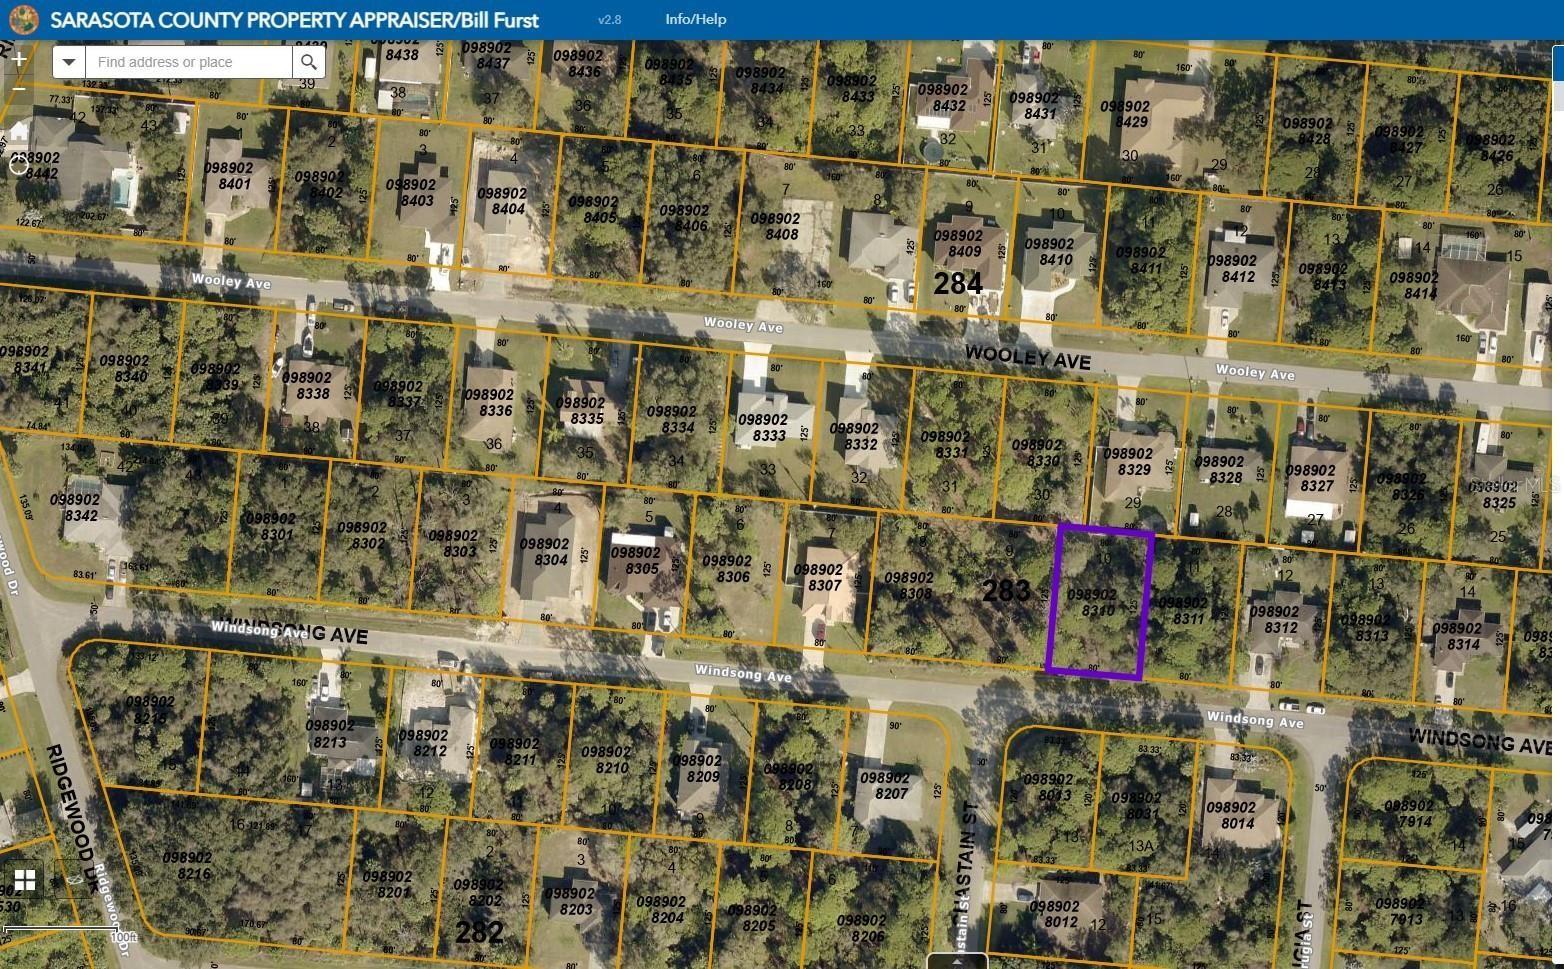 Photo of WINDSONG AVENUE, NORTH PORT, FL 34287 (MLS # A4502981)